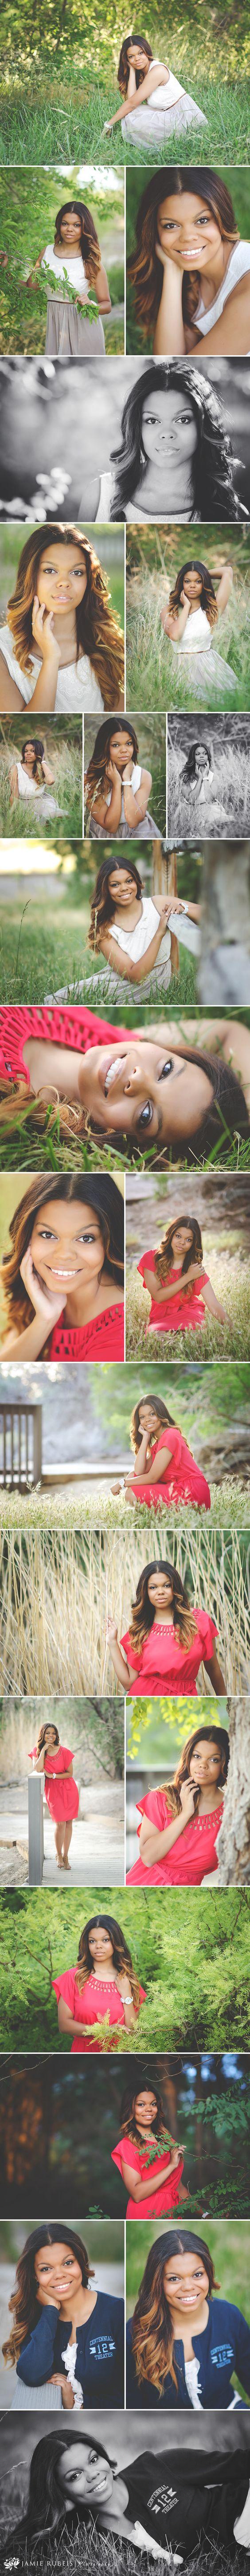 Alaynas Senior Portrait Session - Jamie Rubeis Photography